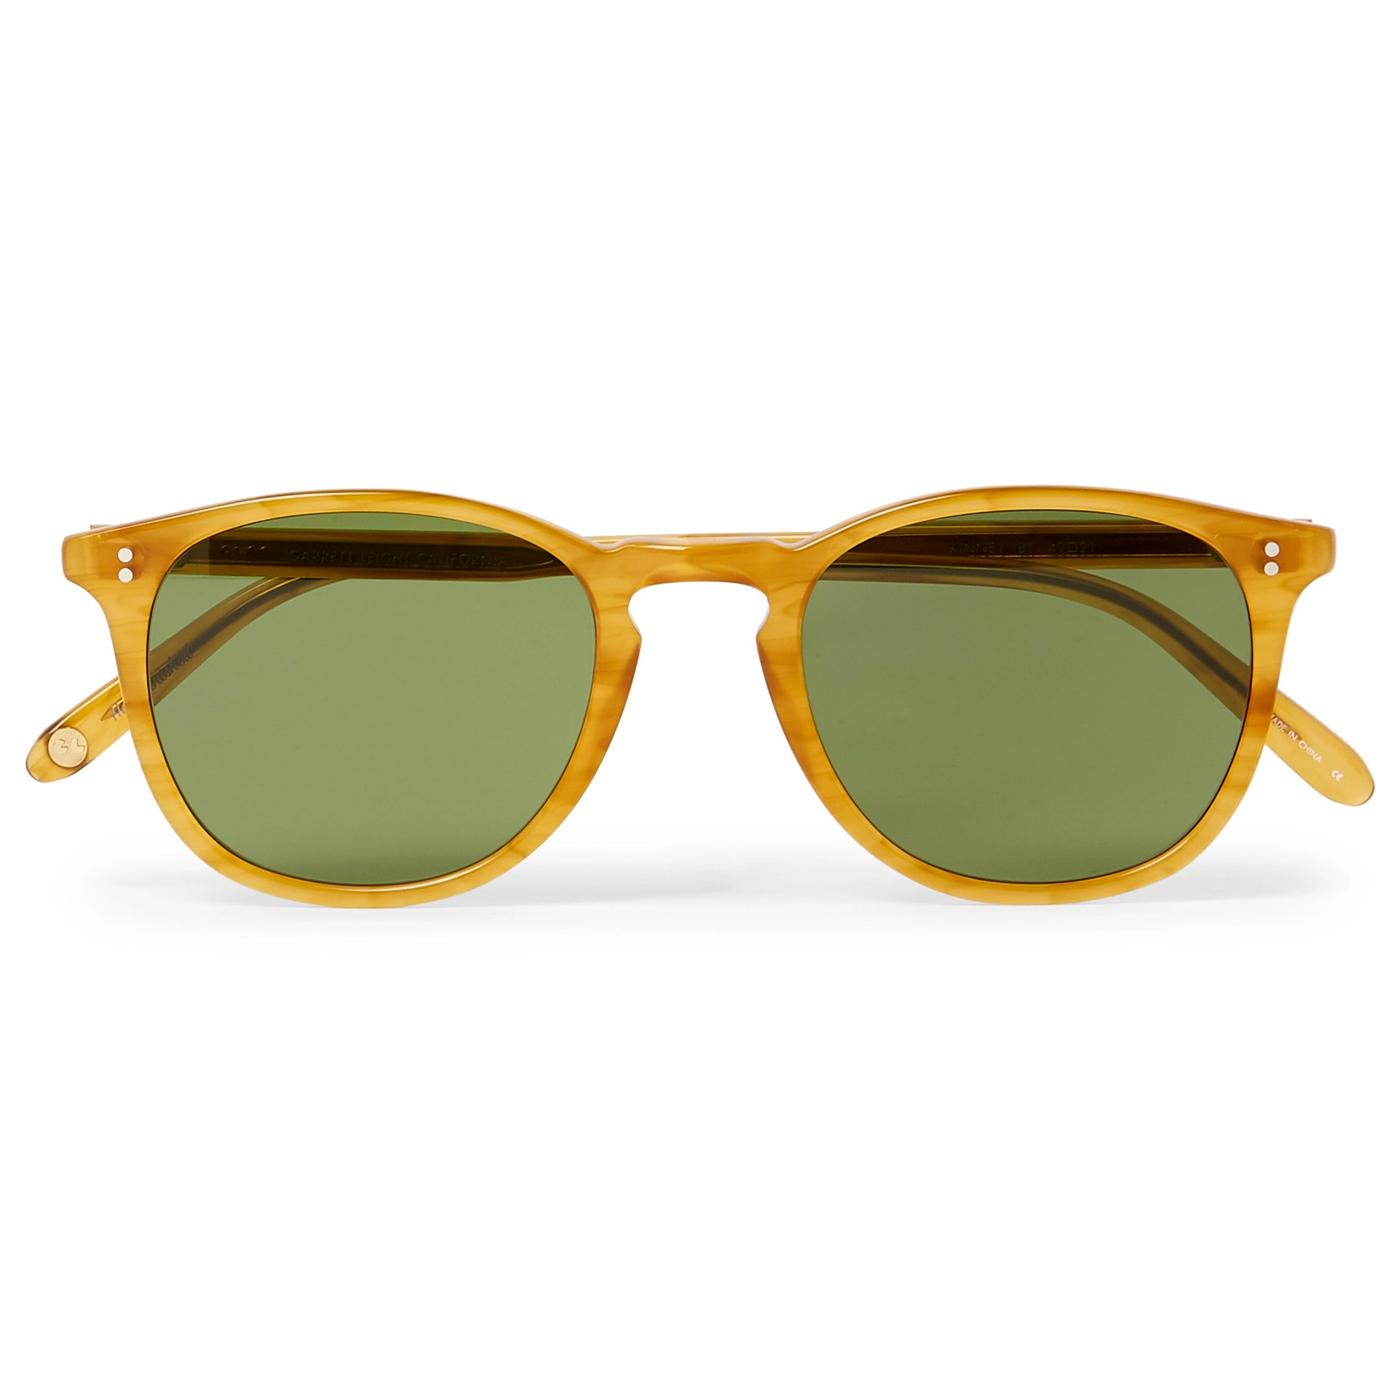 Style Mr Porter Lunettes de Soleil Garreth Leight Kinney 49